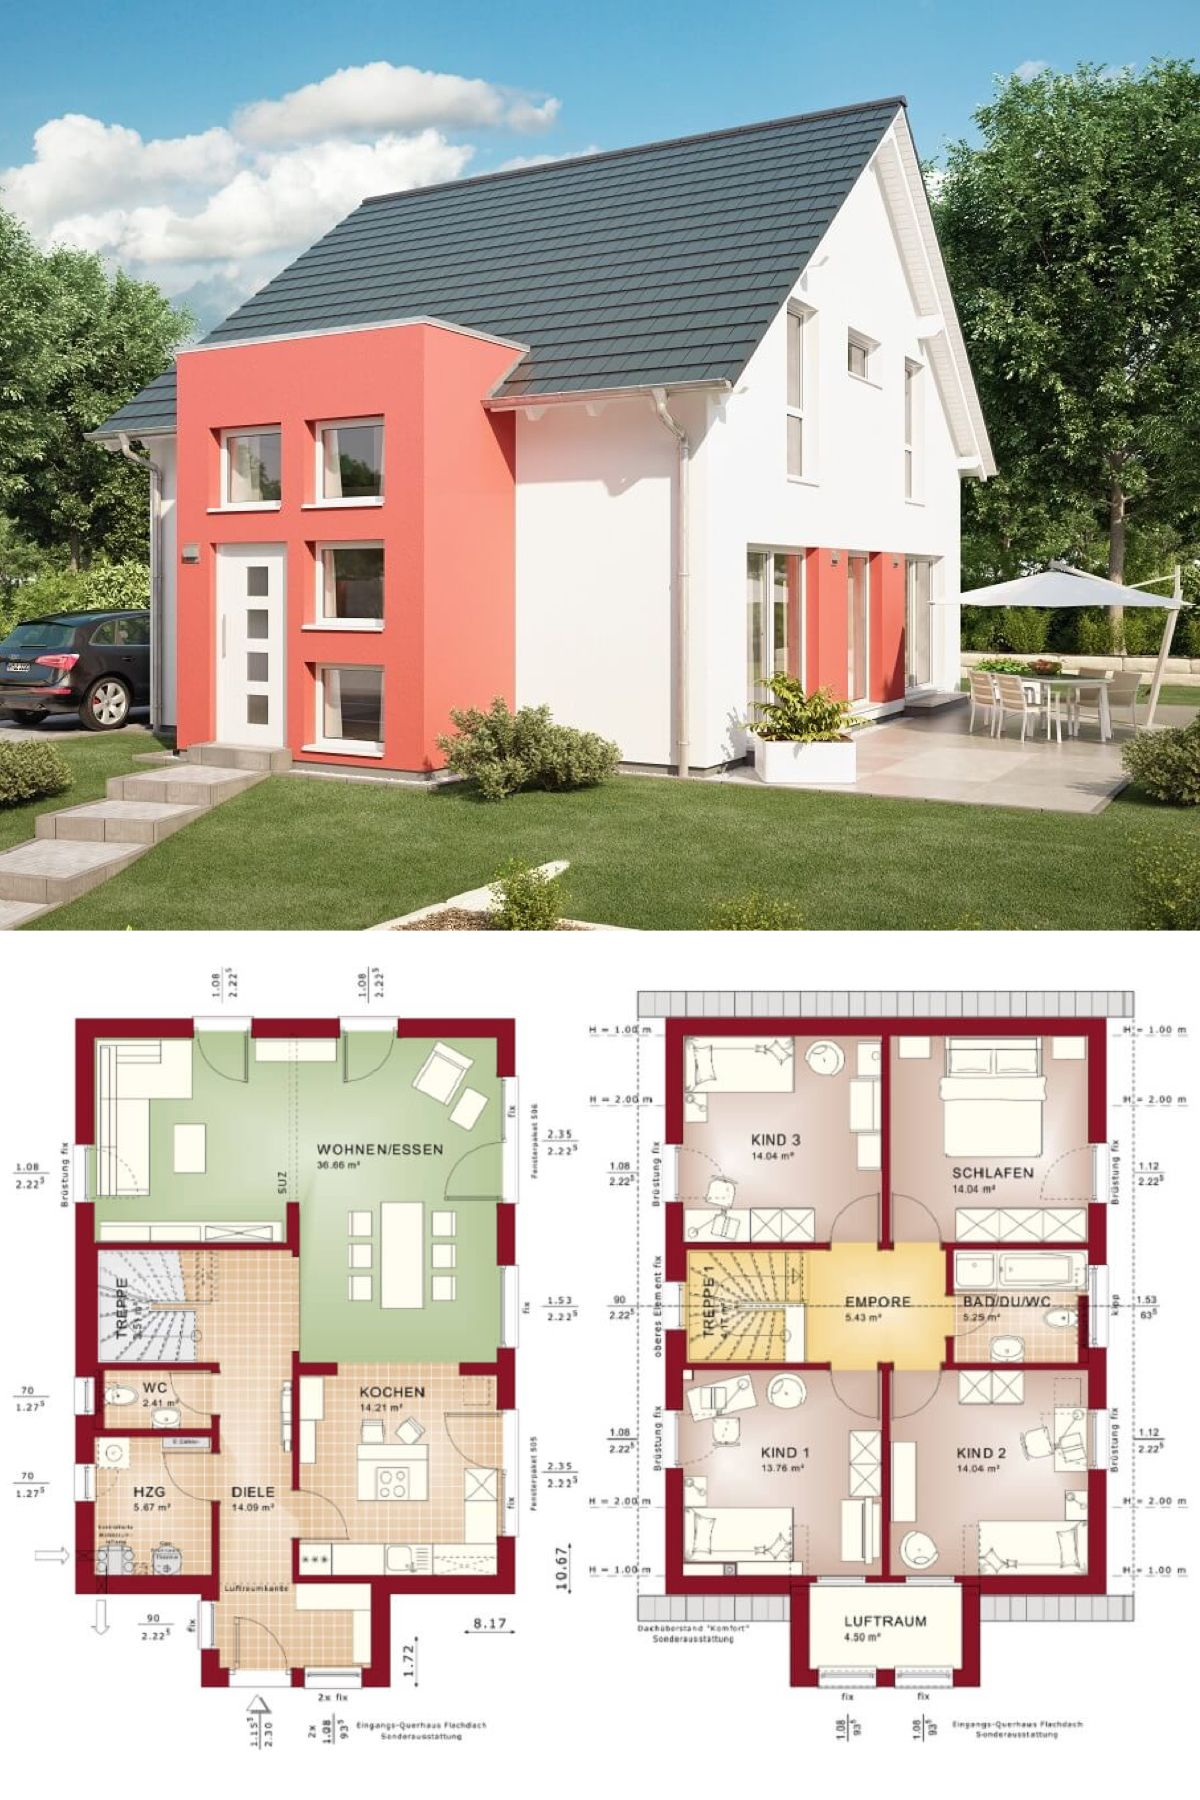 haus fassade mit roten farbakzenten fertighaus grundriss celebration 137 v7 bien zenker. Black Bedroom Furniture Sets. Home Design Ideas